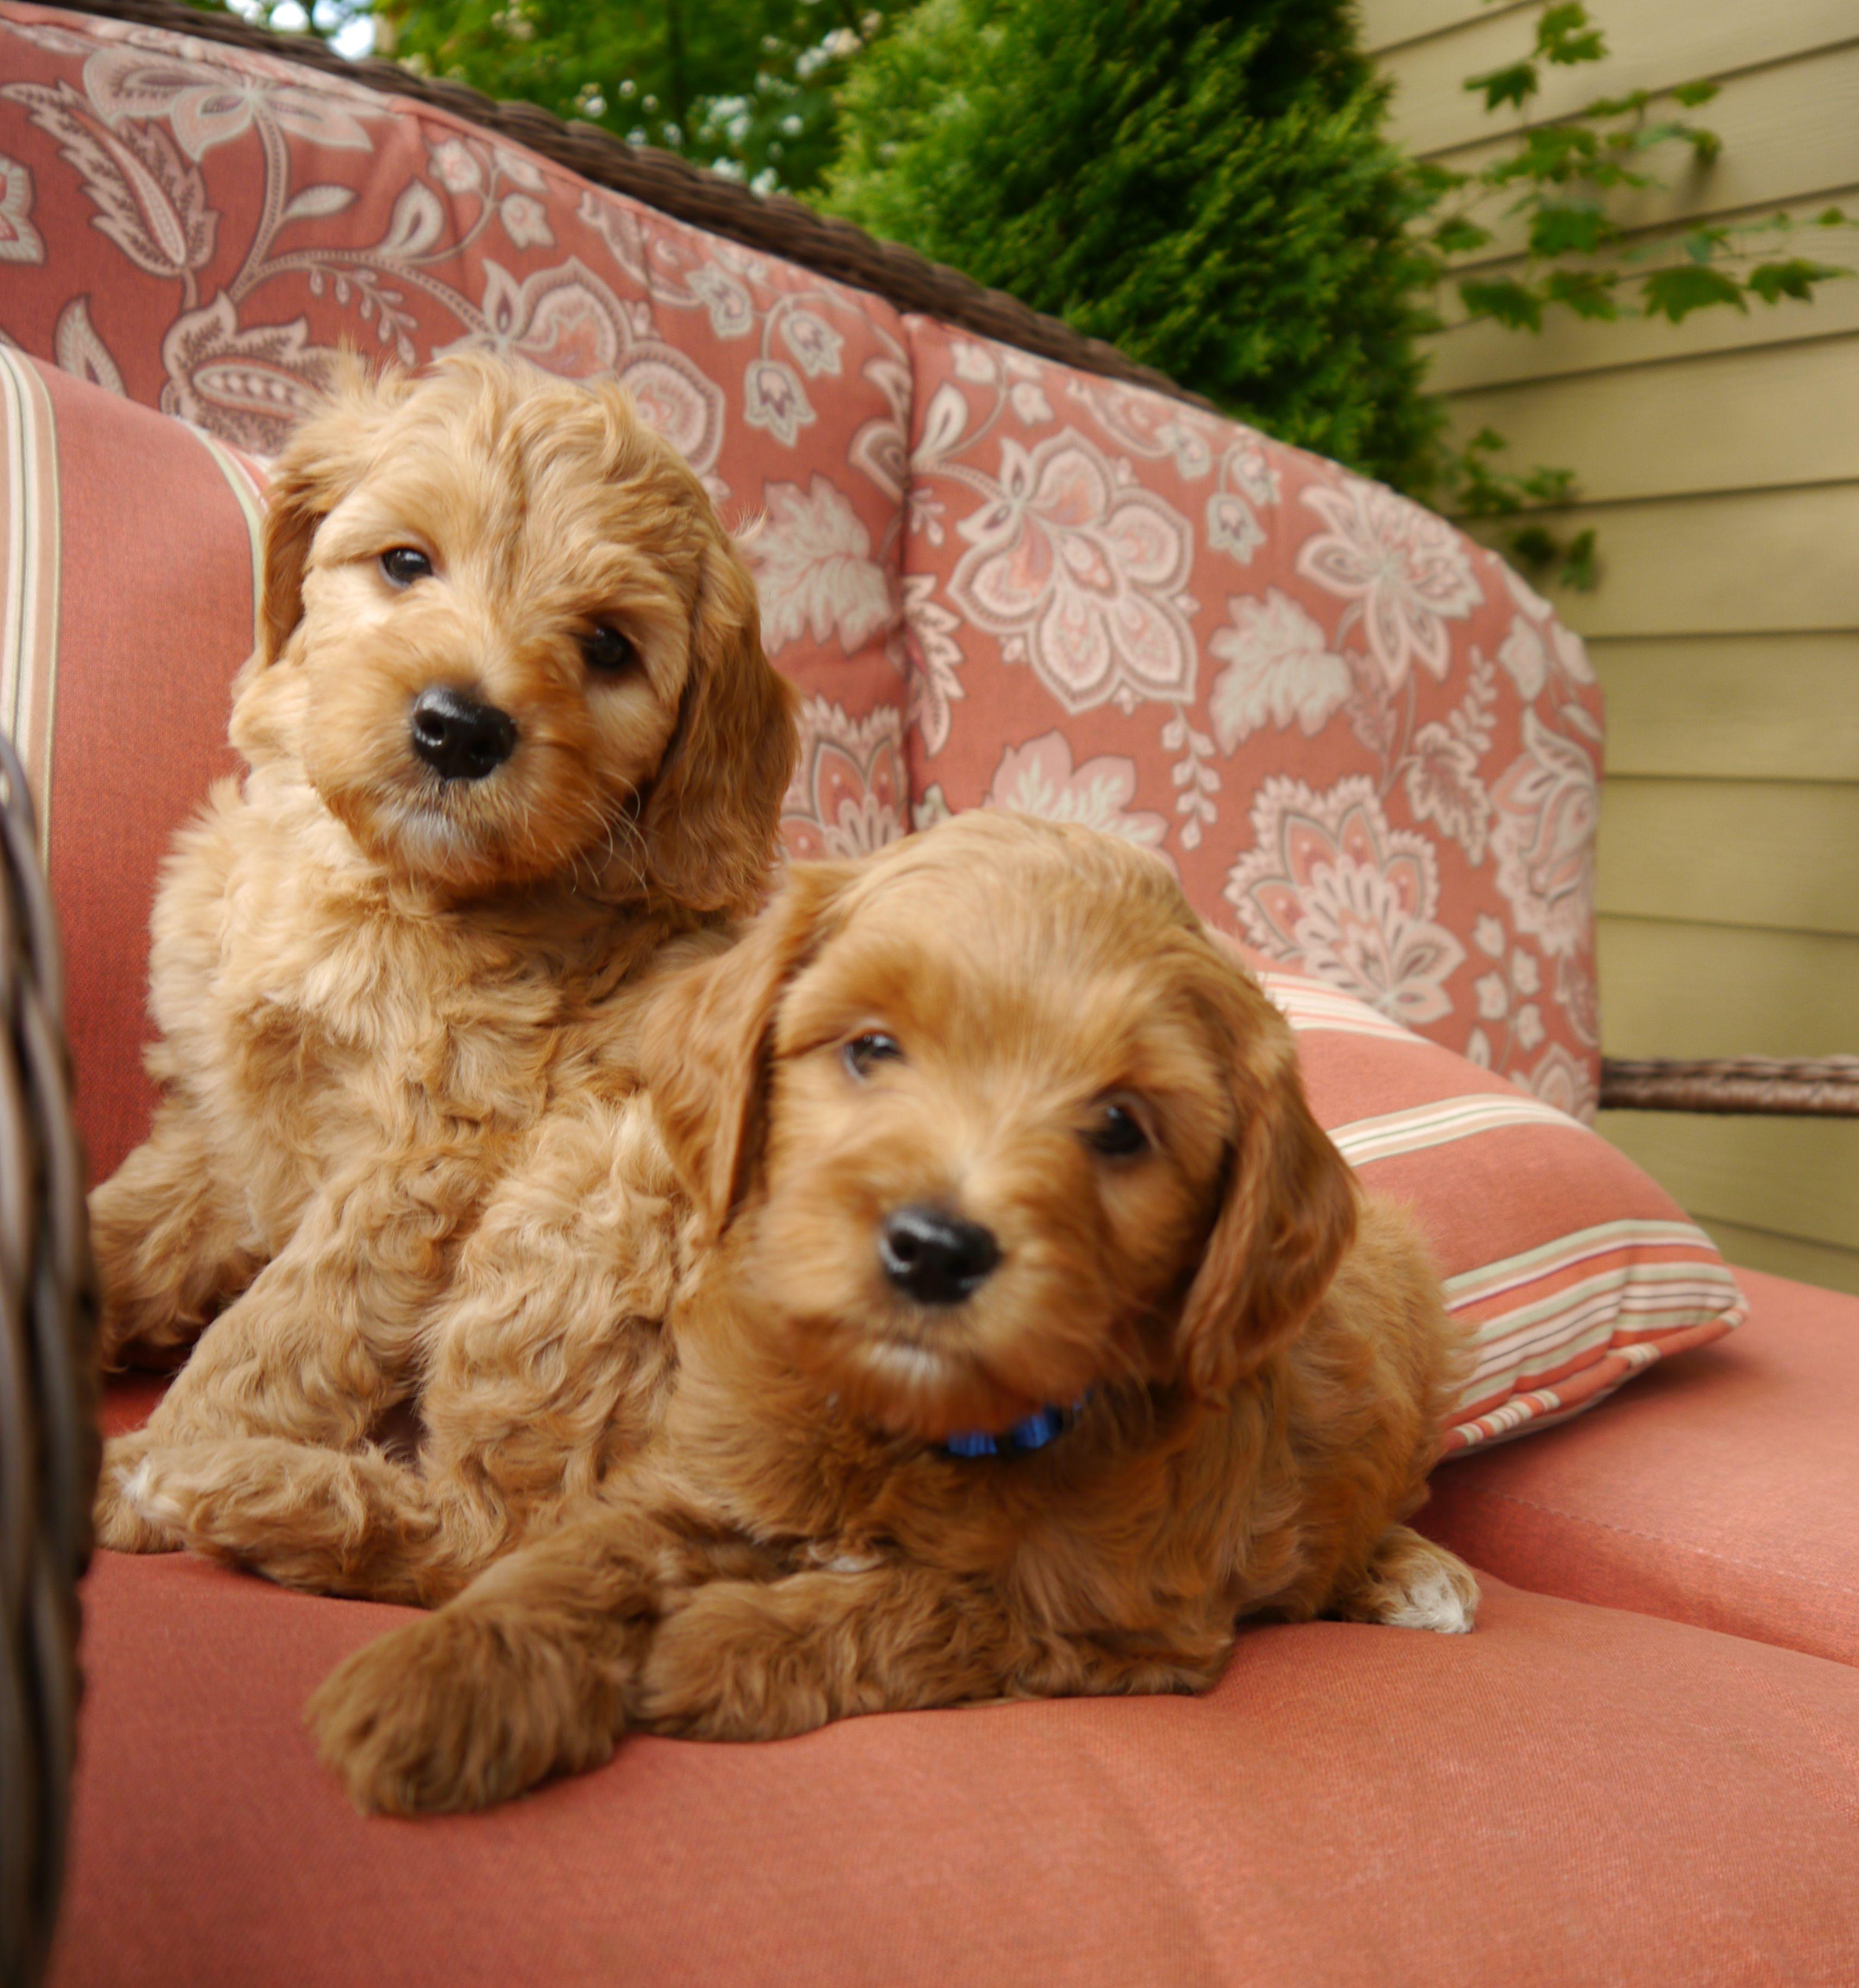 Oregon Labradoodle puppies standards and mediums in Washington and Idaho.